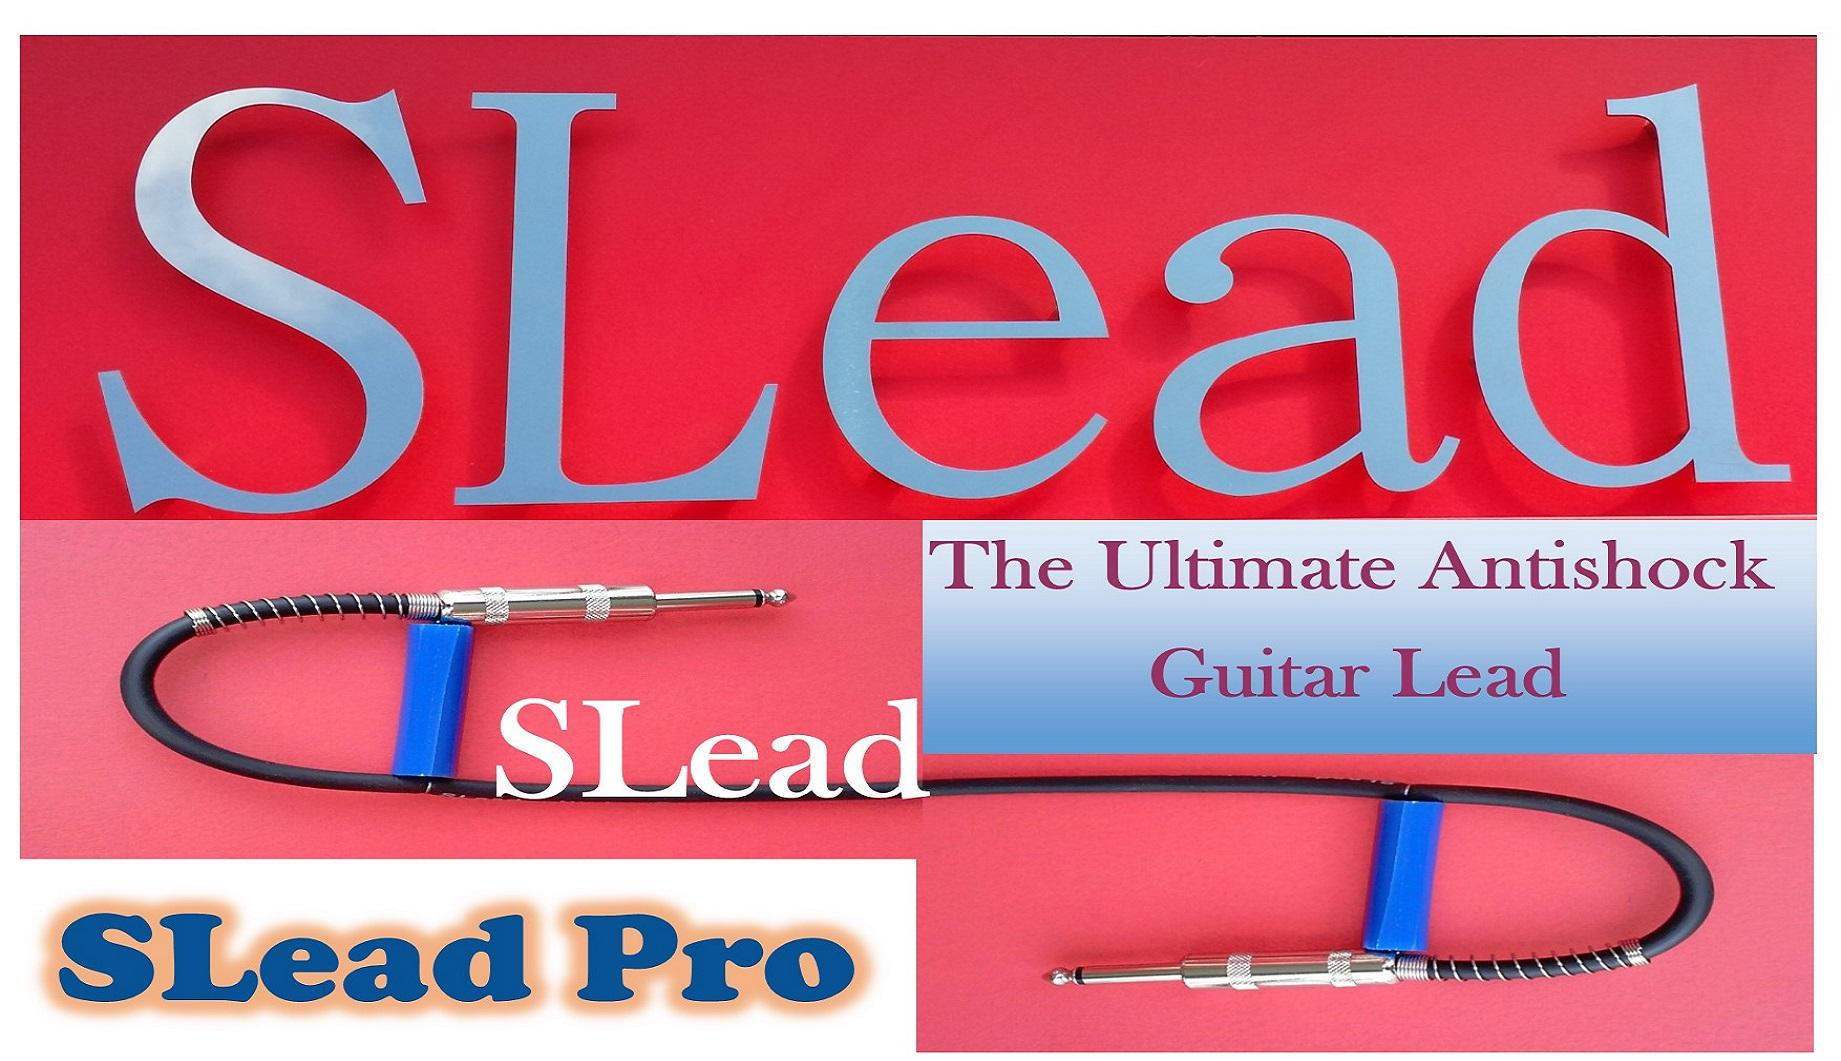 SLead Pro Uk Shipping  Free Postage